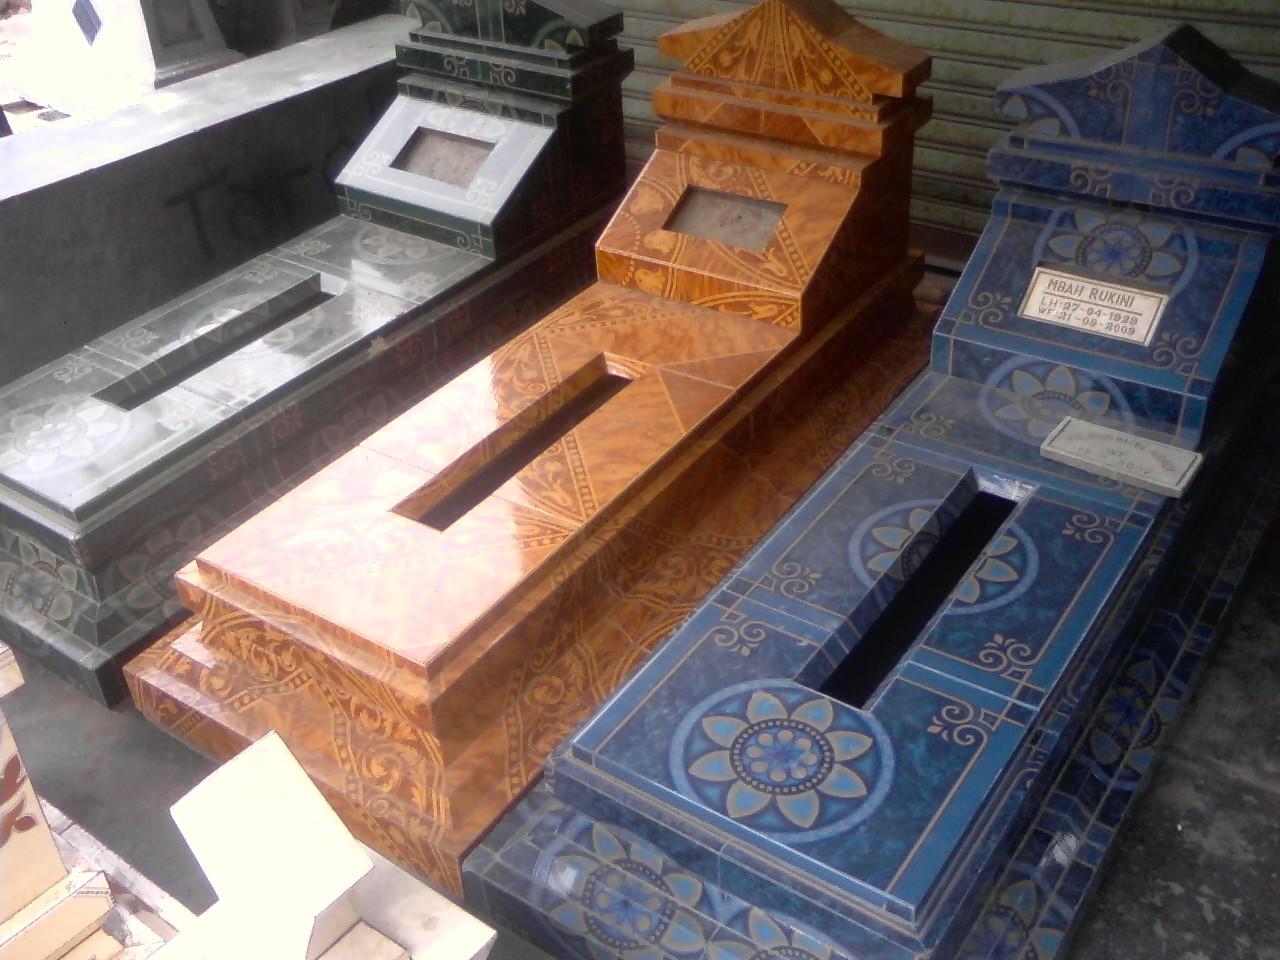 19 Konsep Baru Gambar Keramik Kuburan Kristen